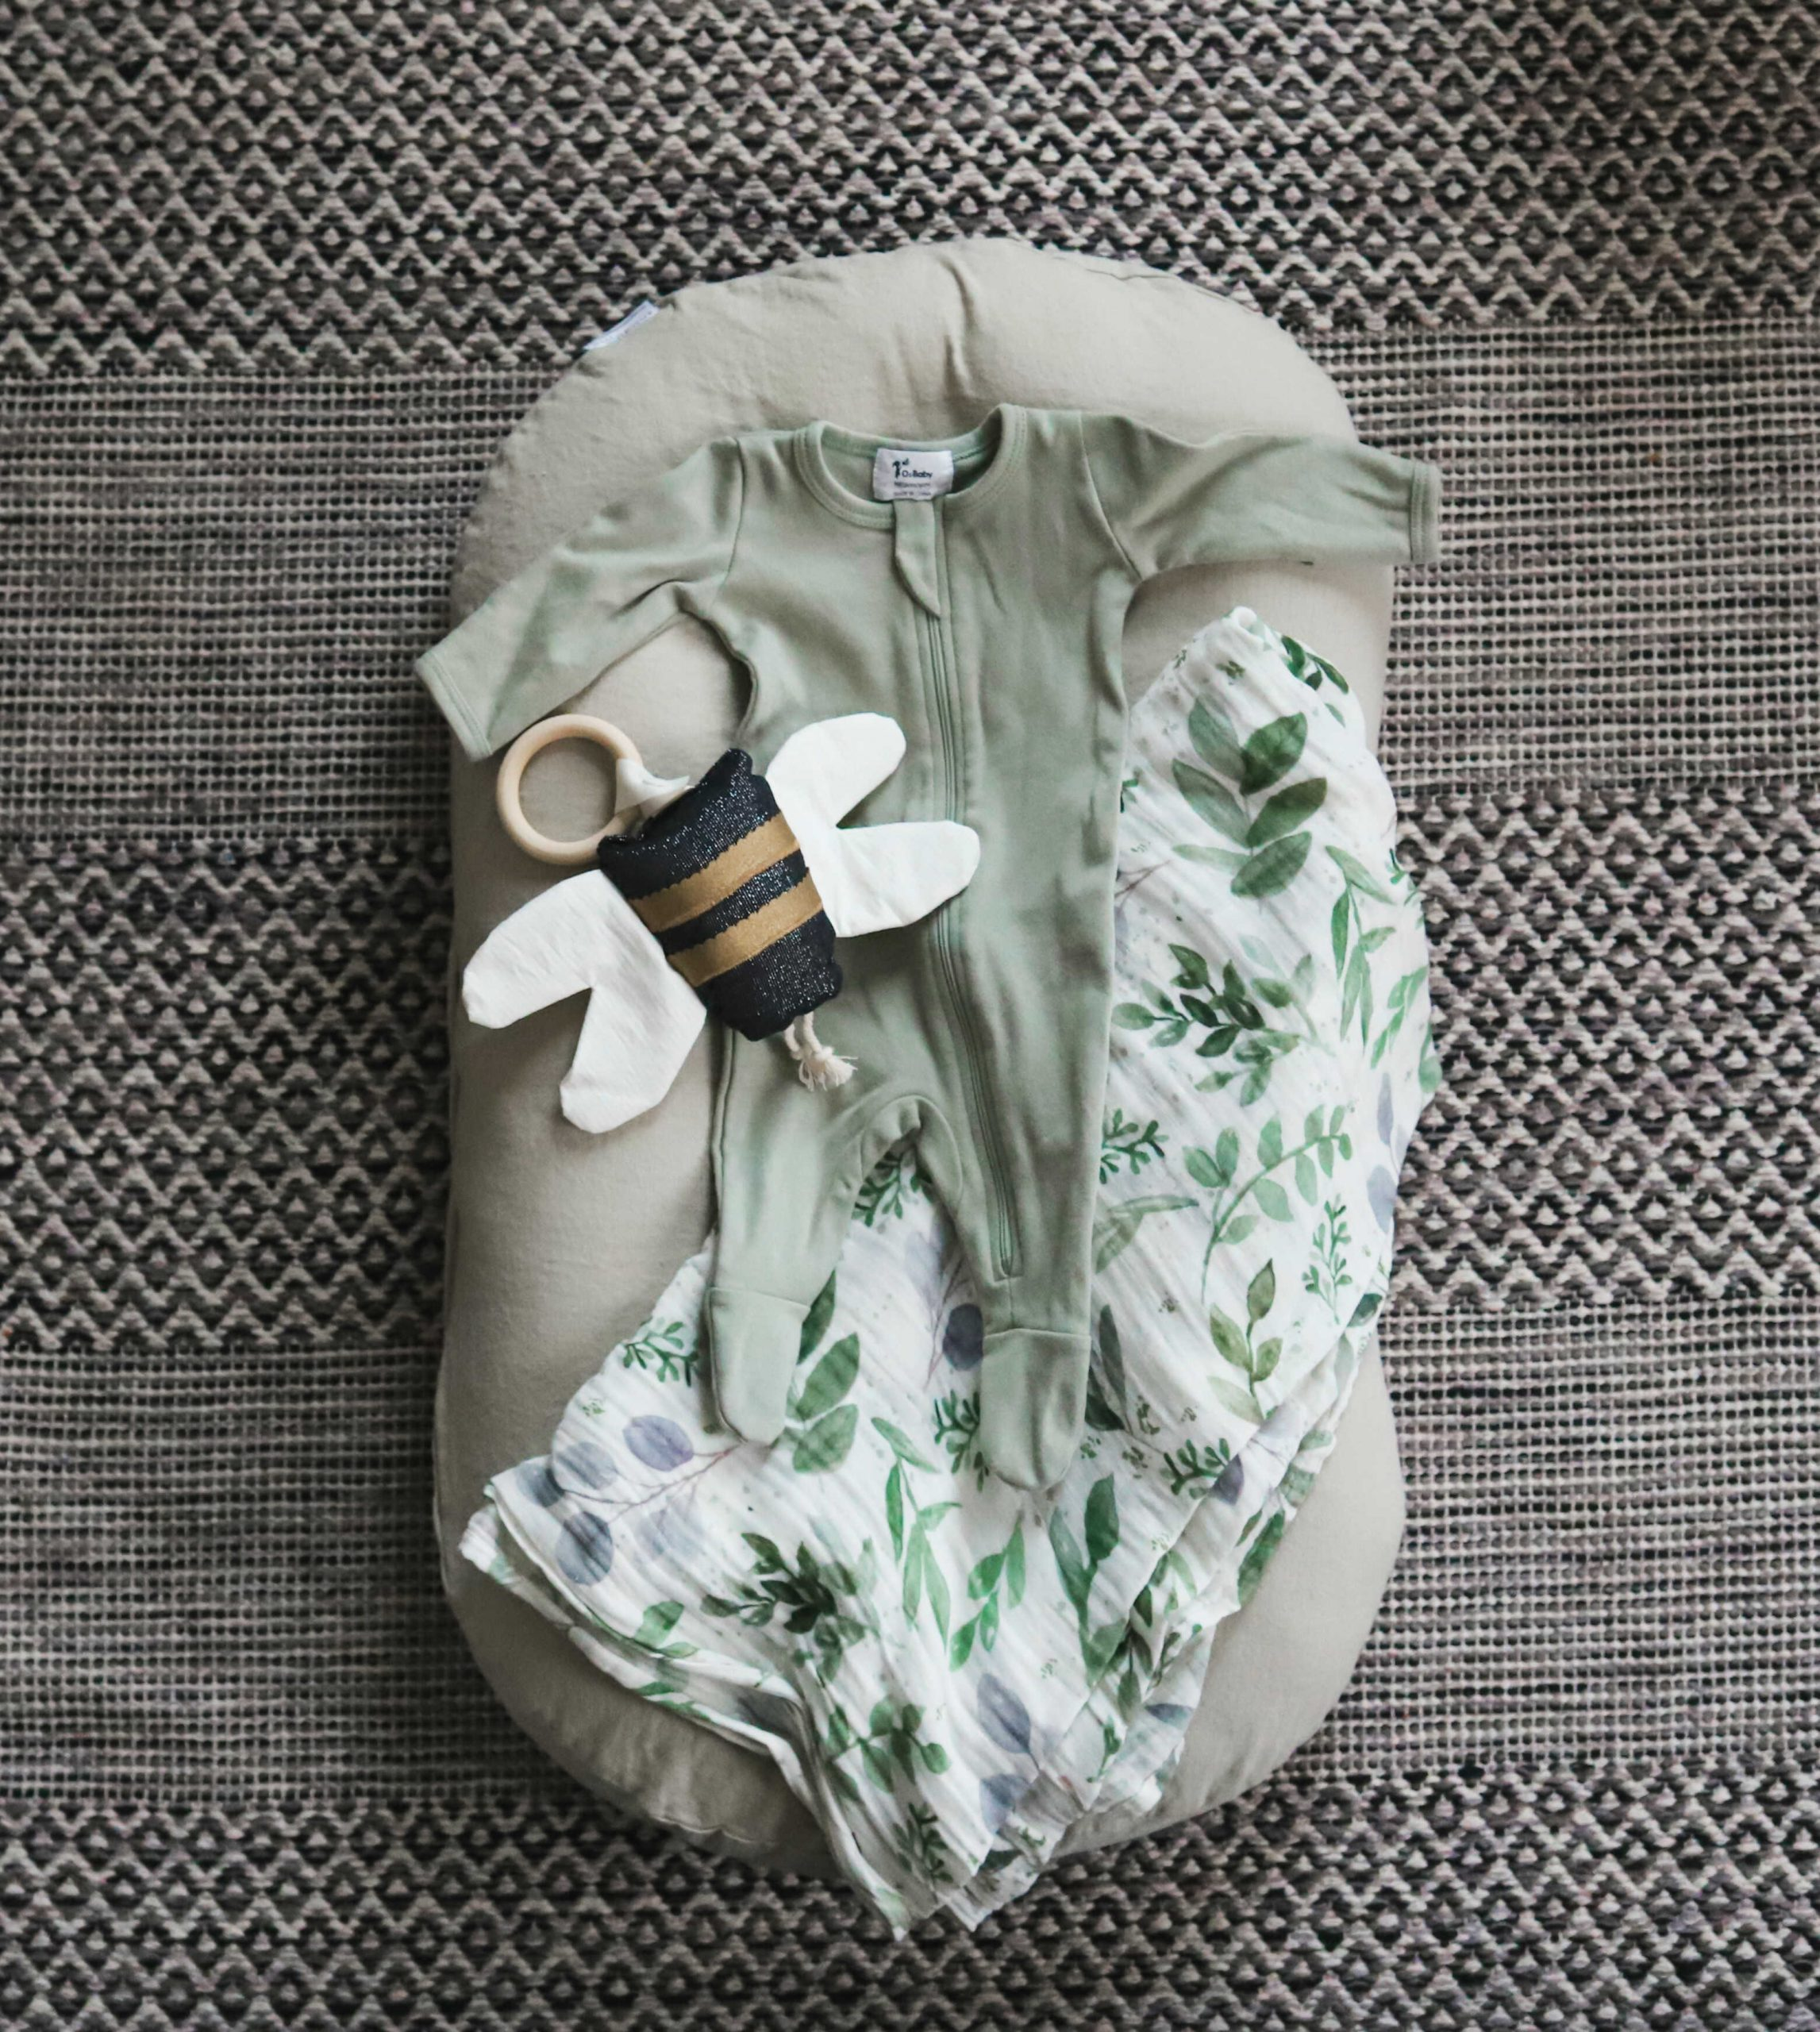 Top 10 Newborn Essentials